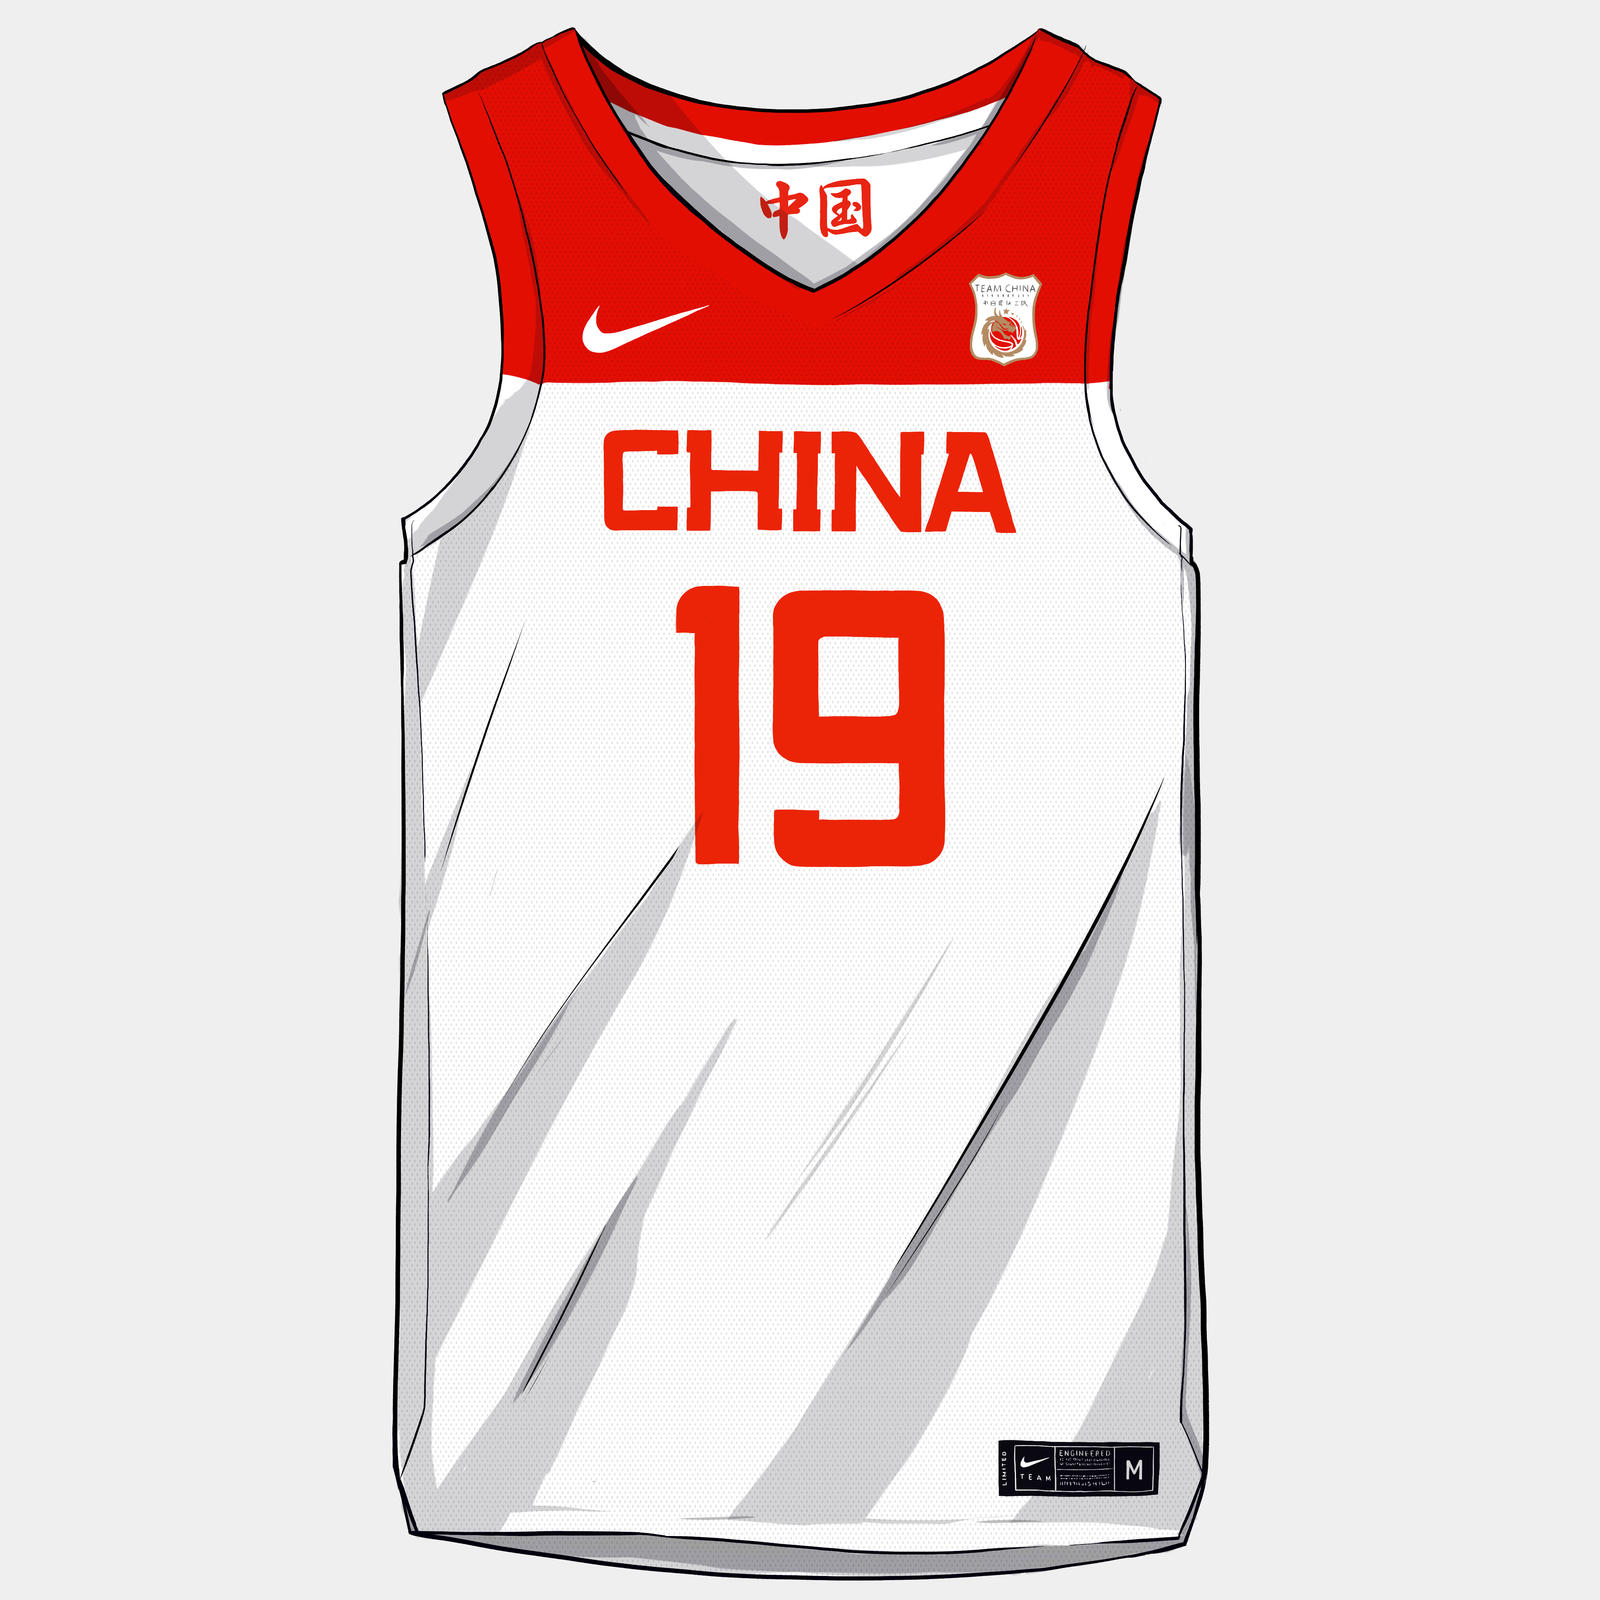 nike-news-china-national-team-kit-2019-illustration-1x1_2_89516.jpg